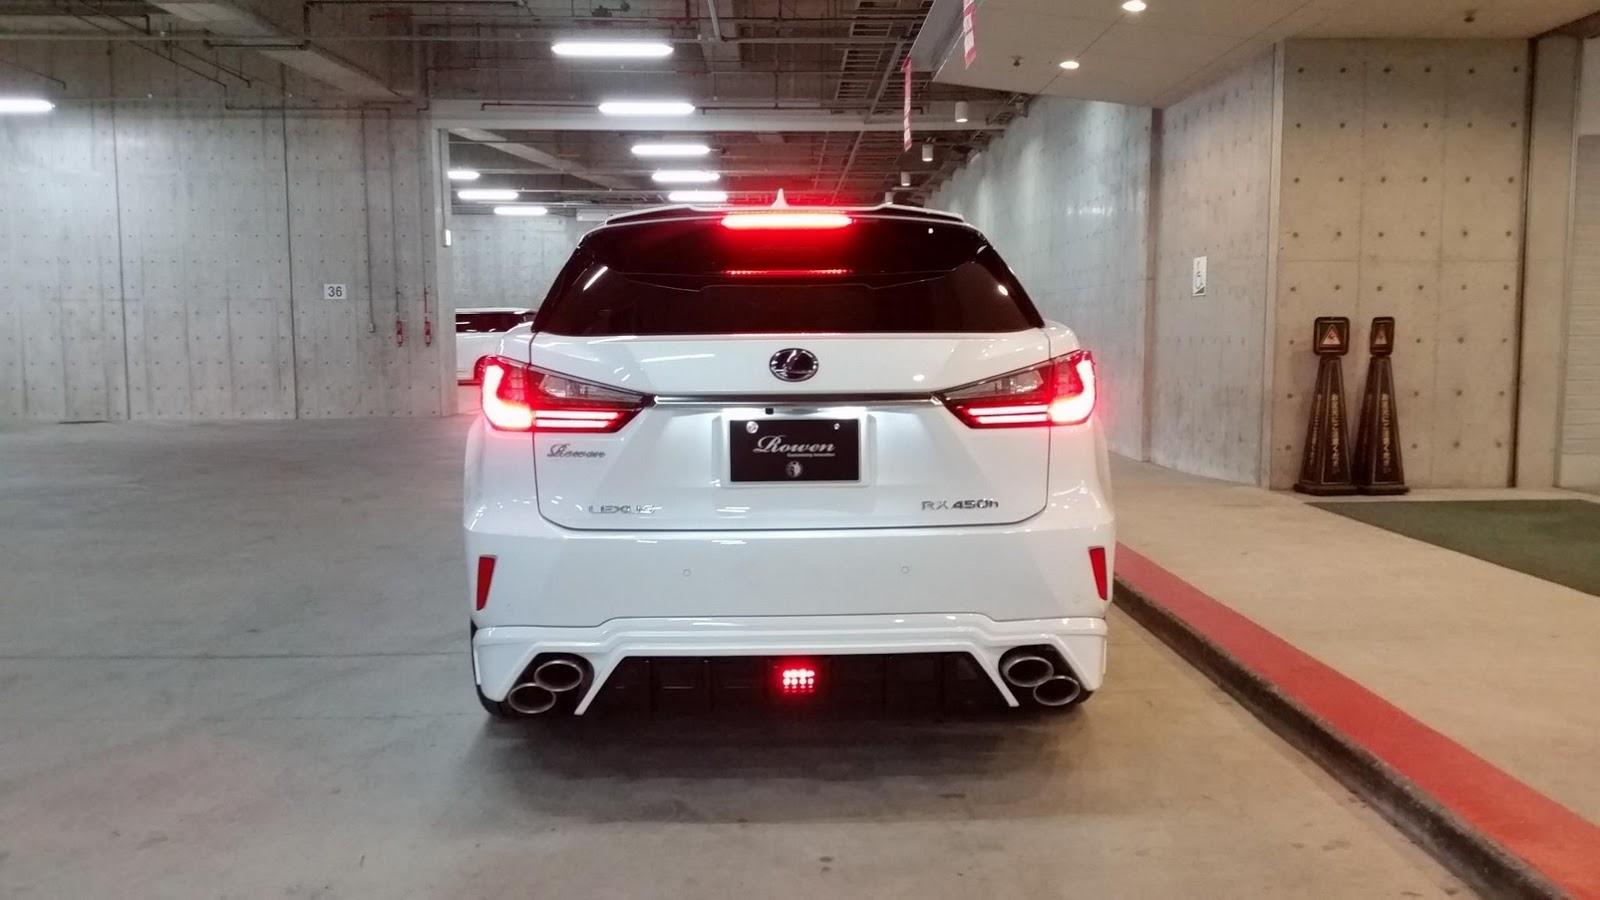 Lexus Nx Vs Rx >> Rowen dials up Lexus RX F Sport's visual aggression ...